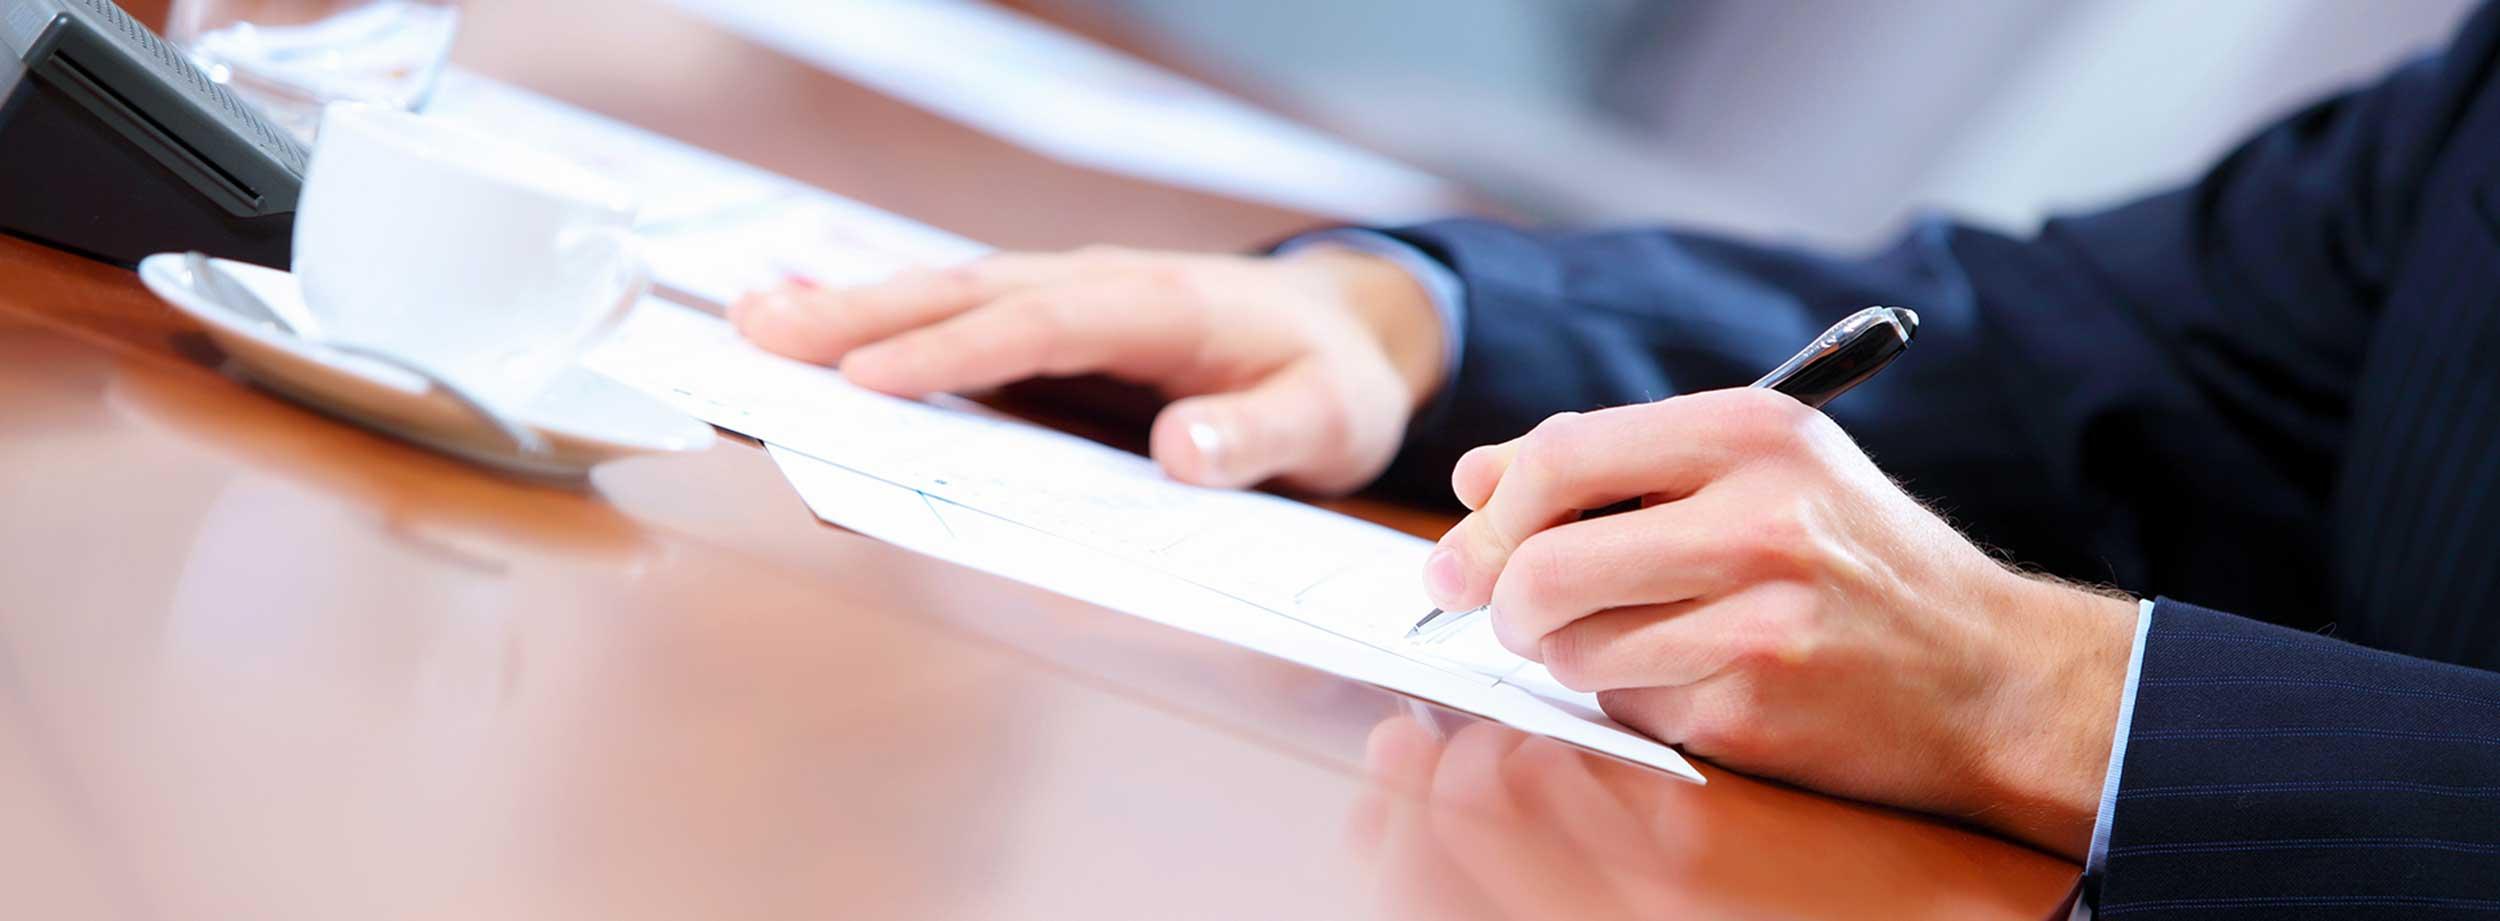 dokumenty, podpis zmluvy, znalecký posudok, znalec